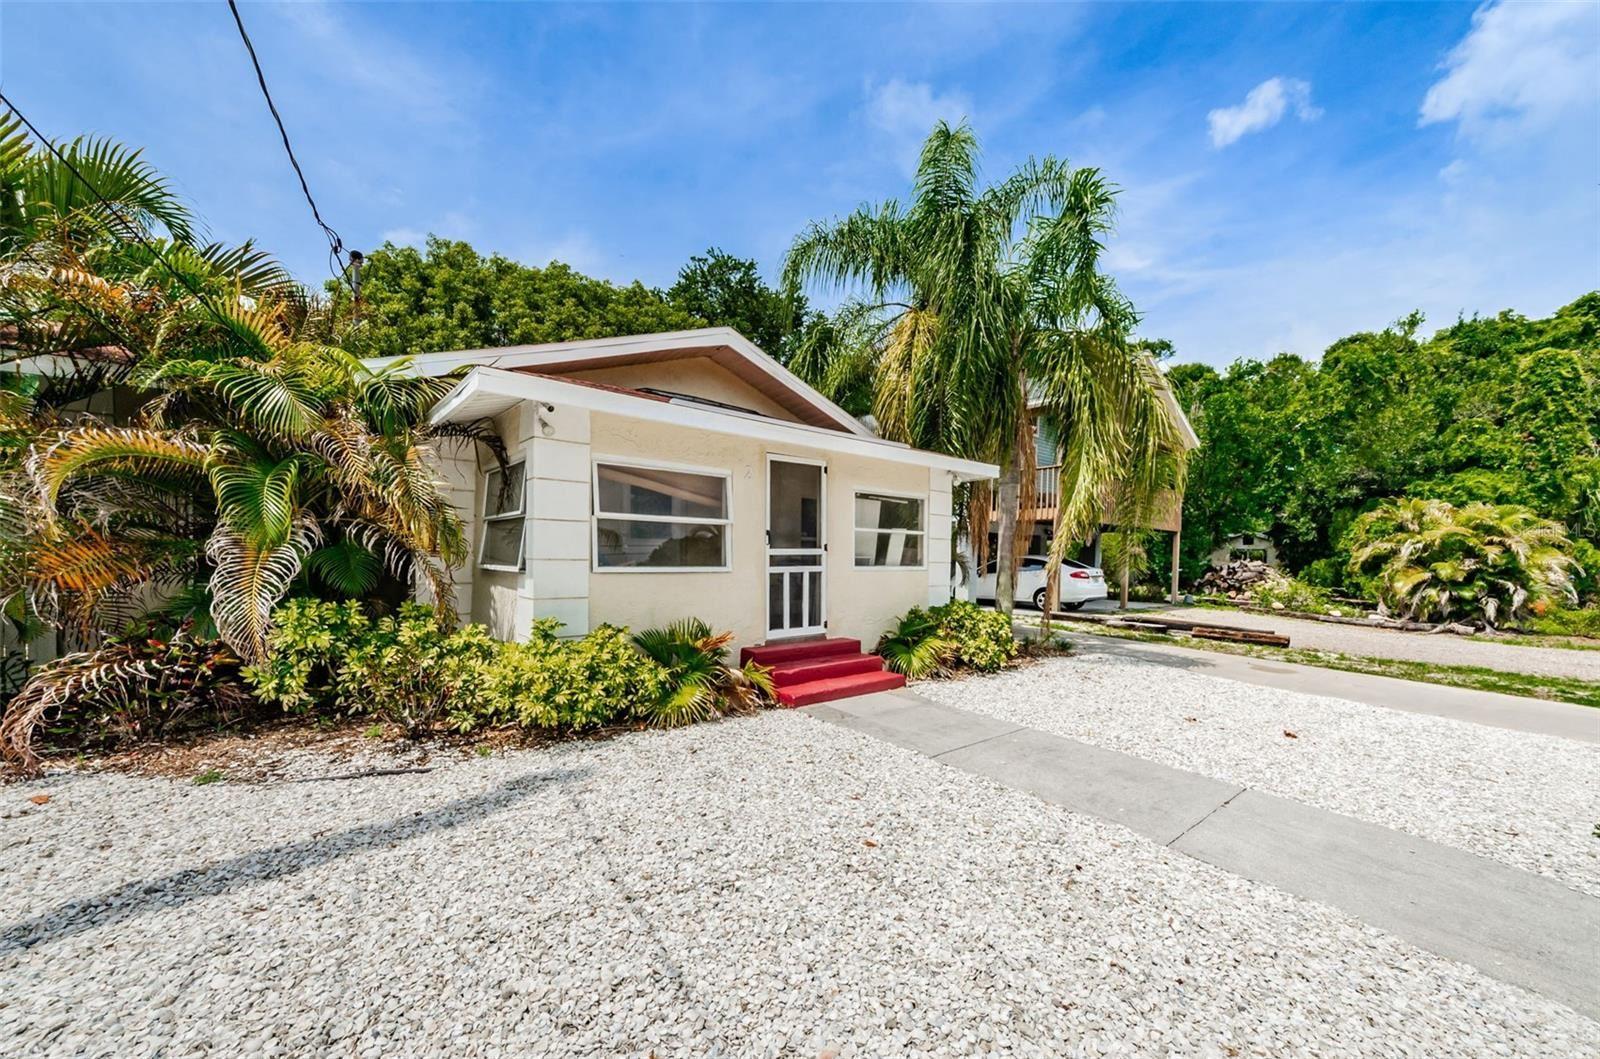 2 LIME STREET, Palm Harbor, FL 34683 - #: U8125679